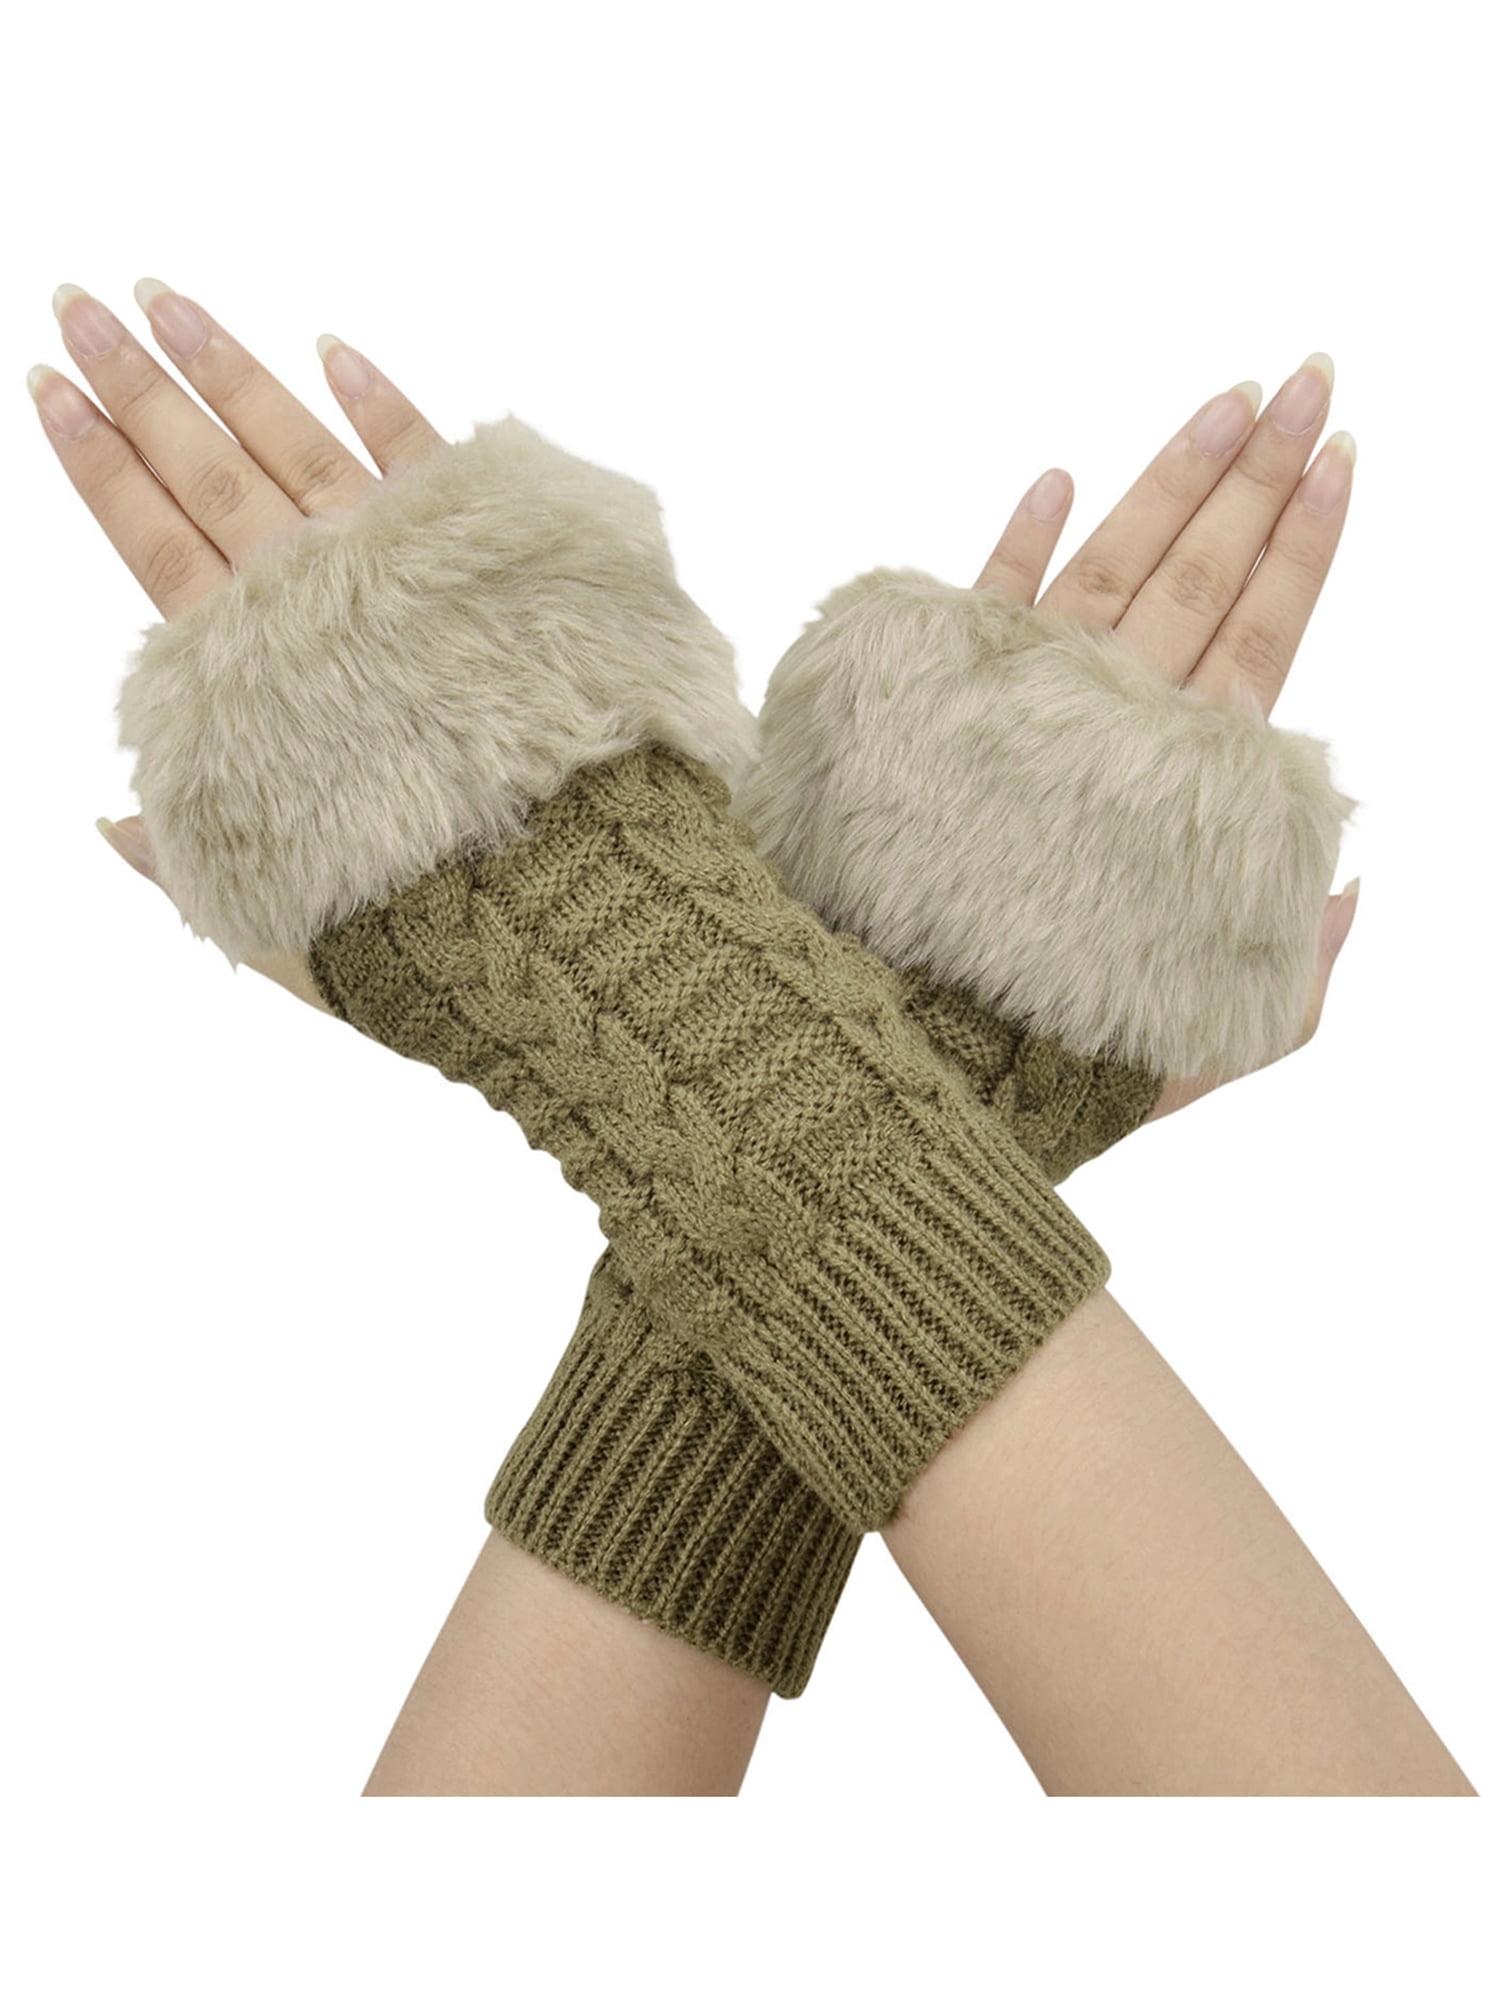 Womens Hand Crochet Arm Warmers Winter Mitten with Thumb Holes,Drak Grey